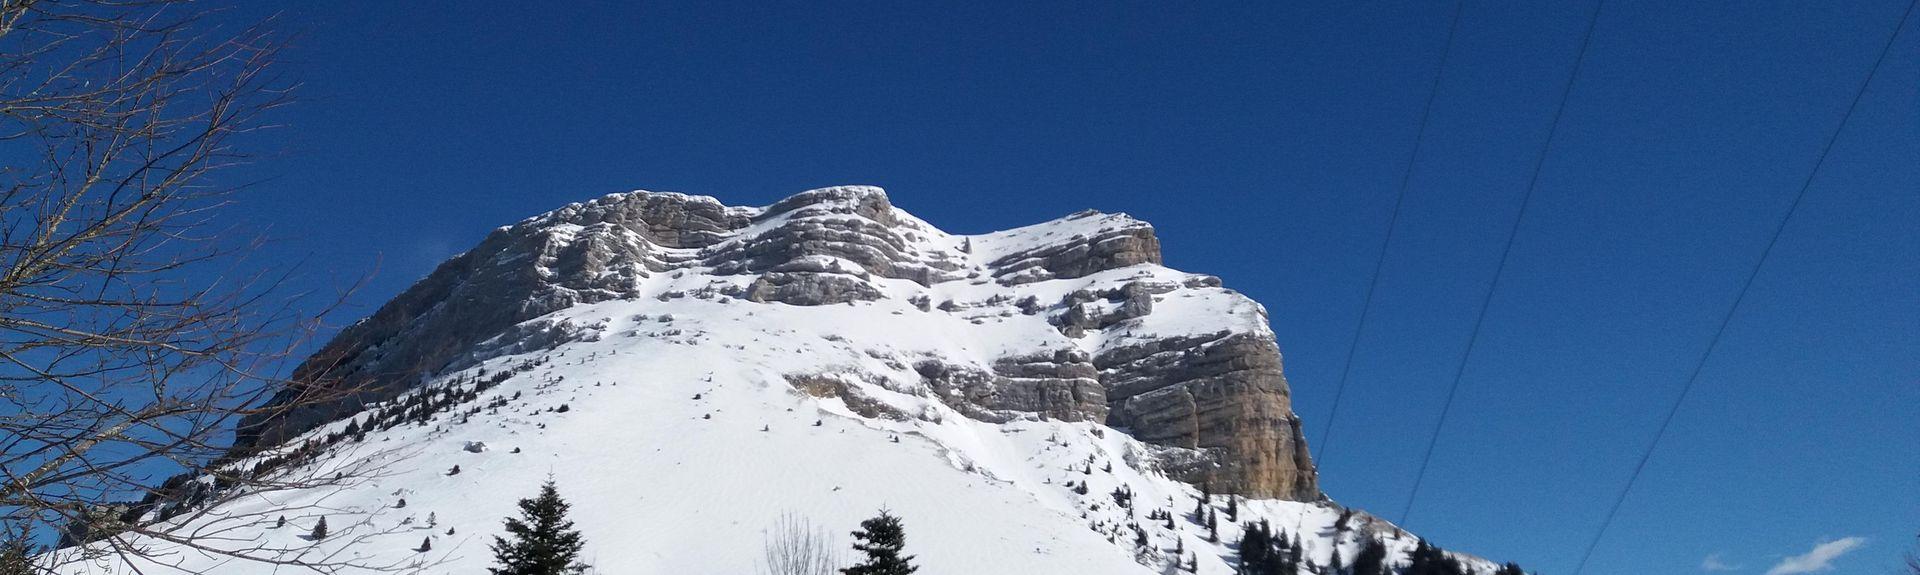 Sarcenas, Auvergne-Rhône-Alpes, Frankrig